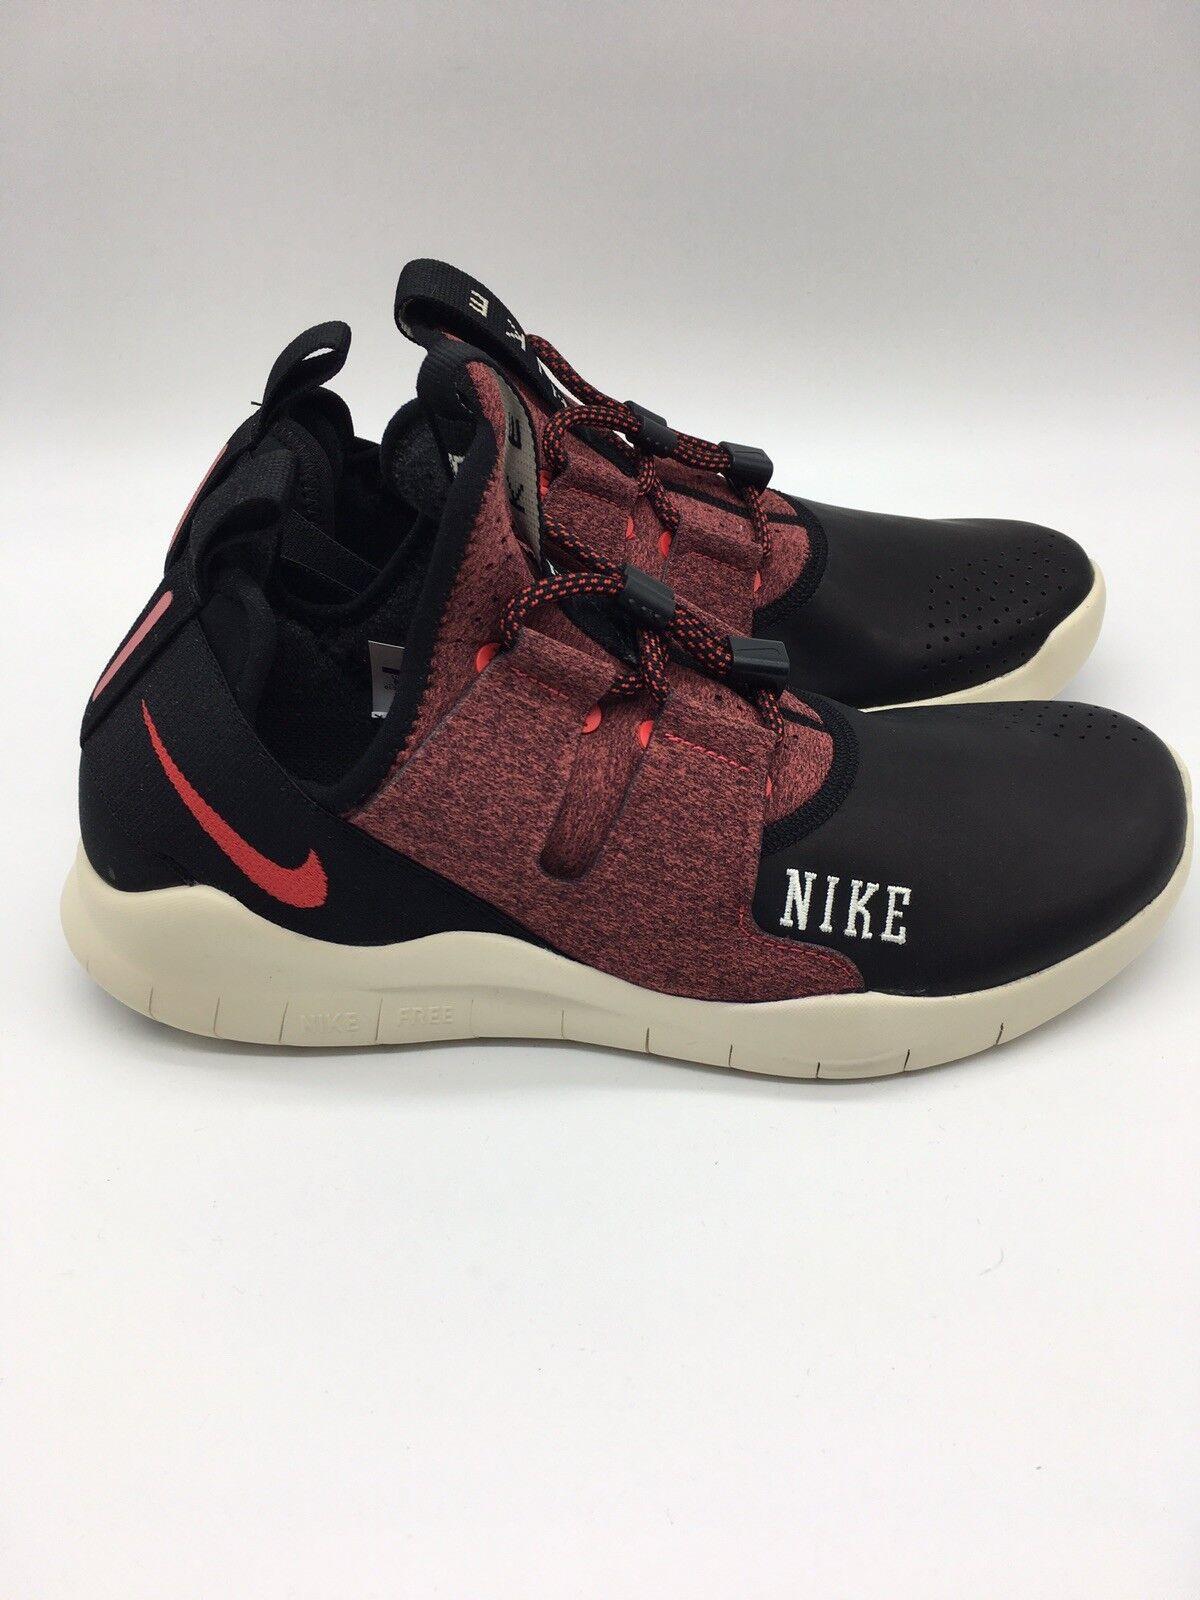 Nike Free RN CMTR 2018 Varsity Mens shoes 8.5 Black University Red Commuter